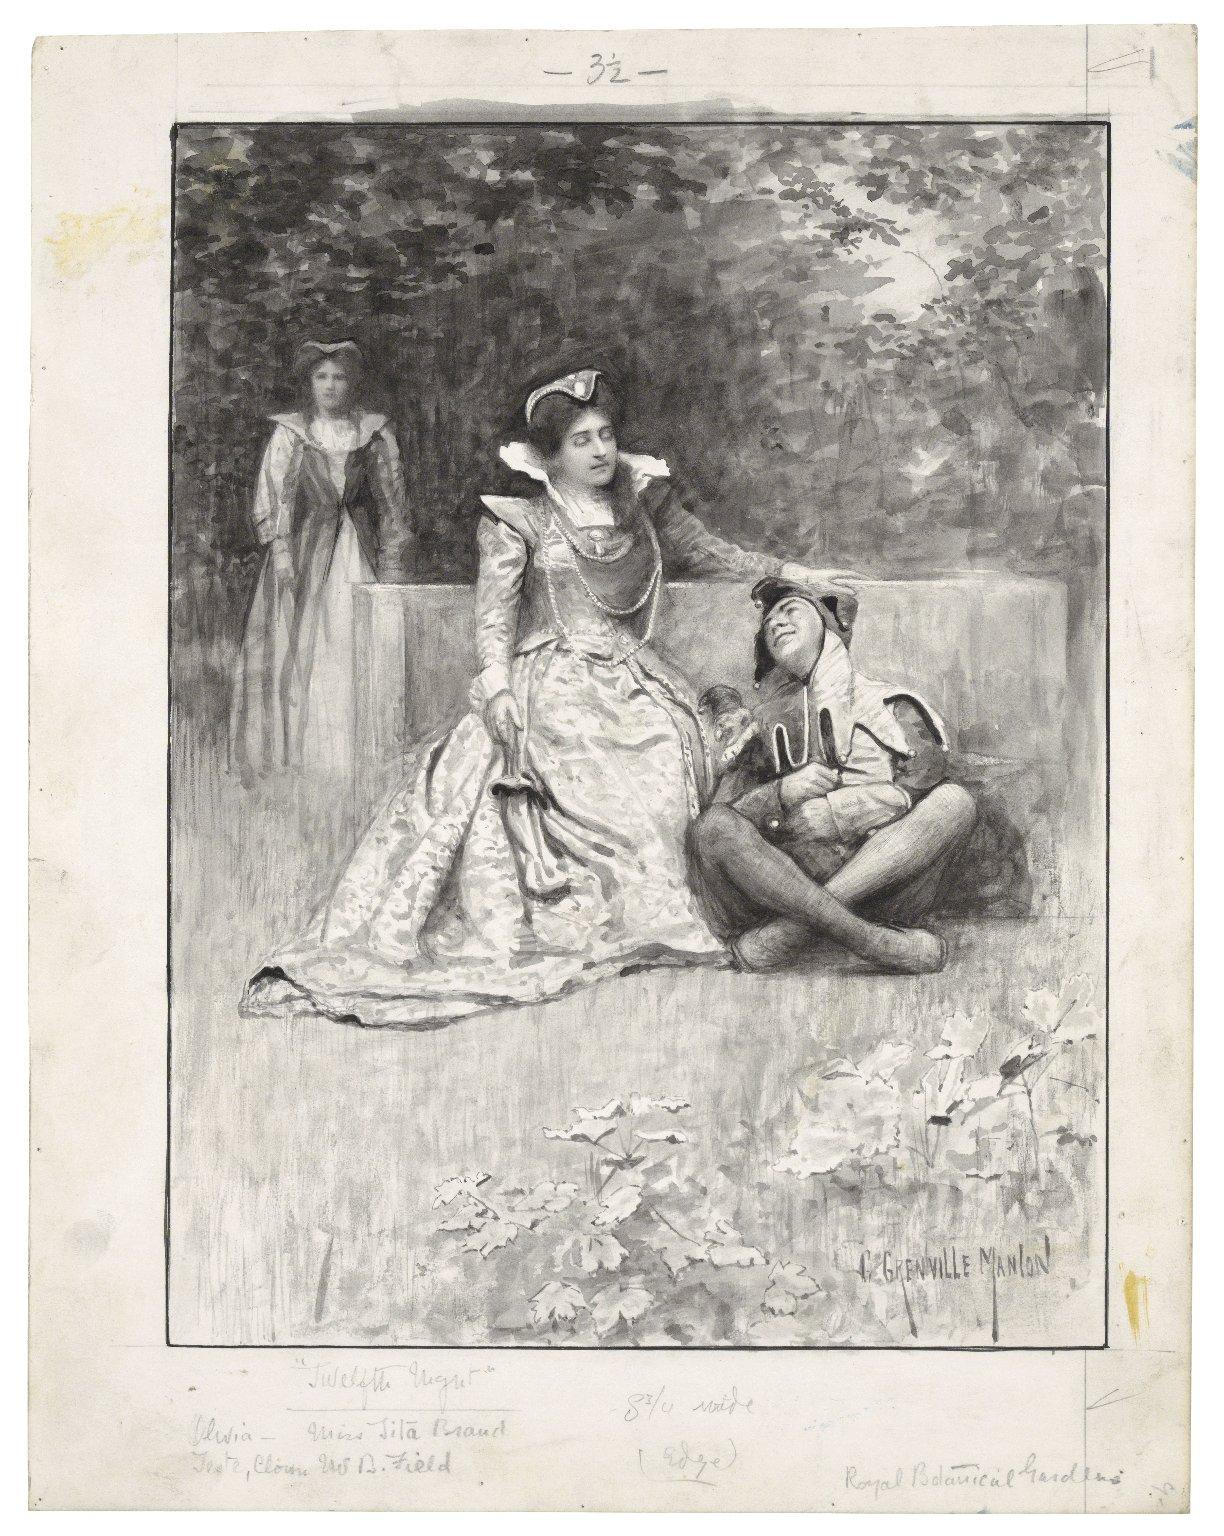 Twelfth night, Olivia - Miss Tita Brand, Feste, Clown - Mr. W. B. Field, [performed at the] Royal Botanical Gardens [graphic] / G. Grenville Manton.